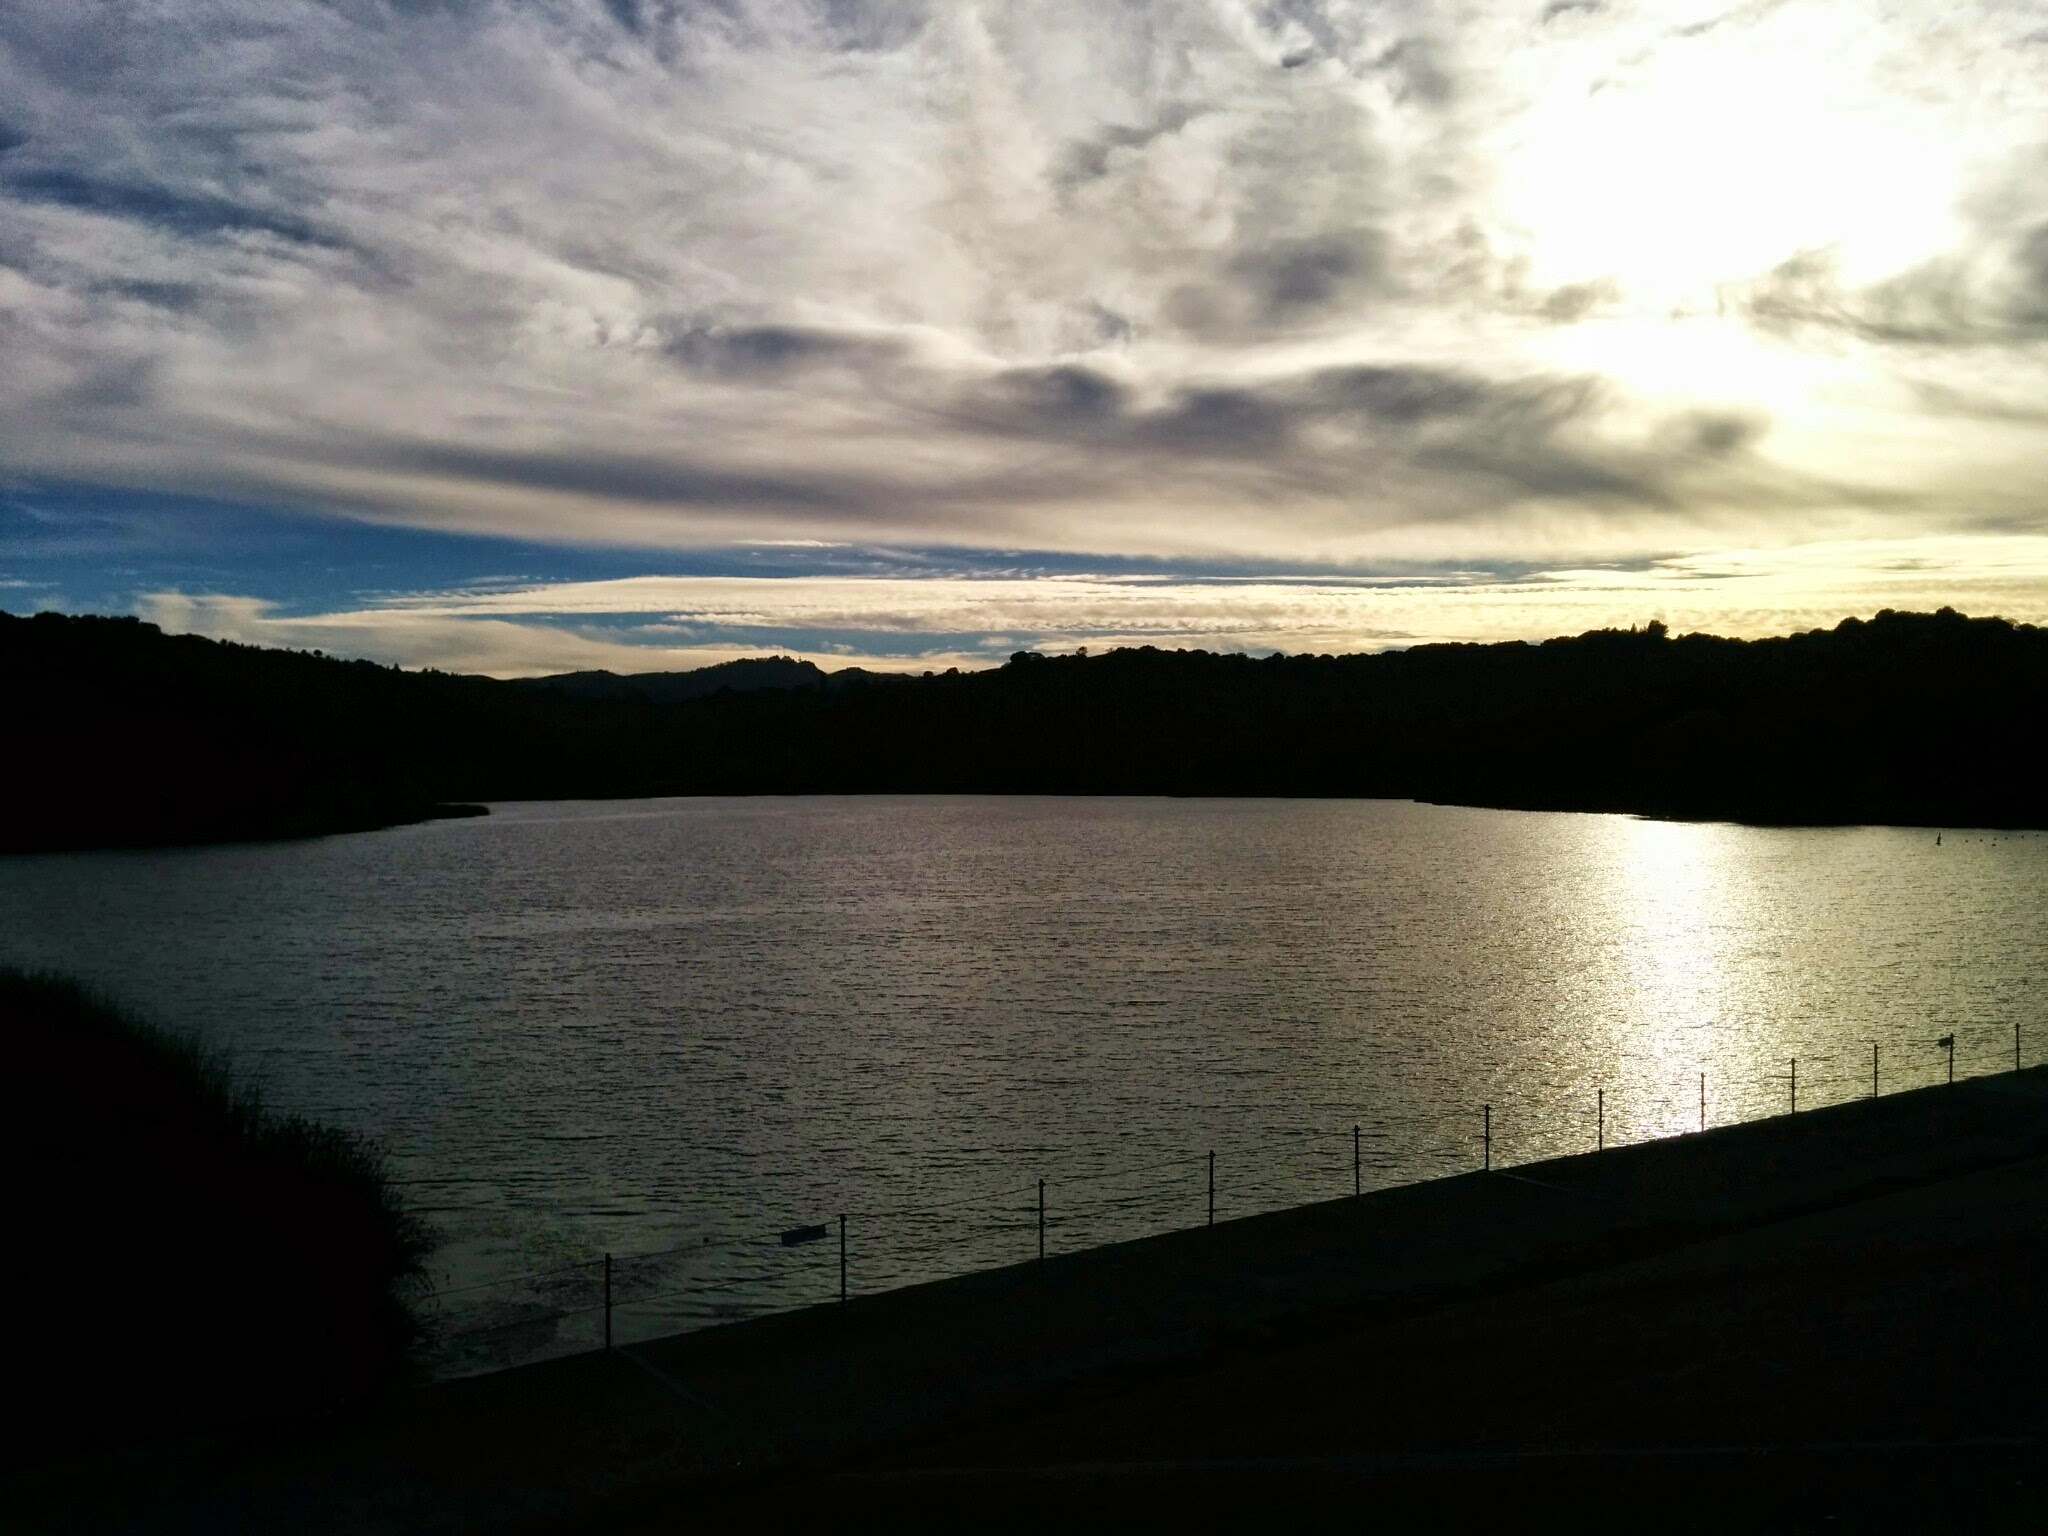 Sunset at Lafayette reservoir